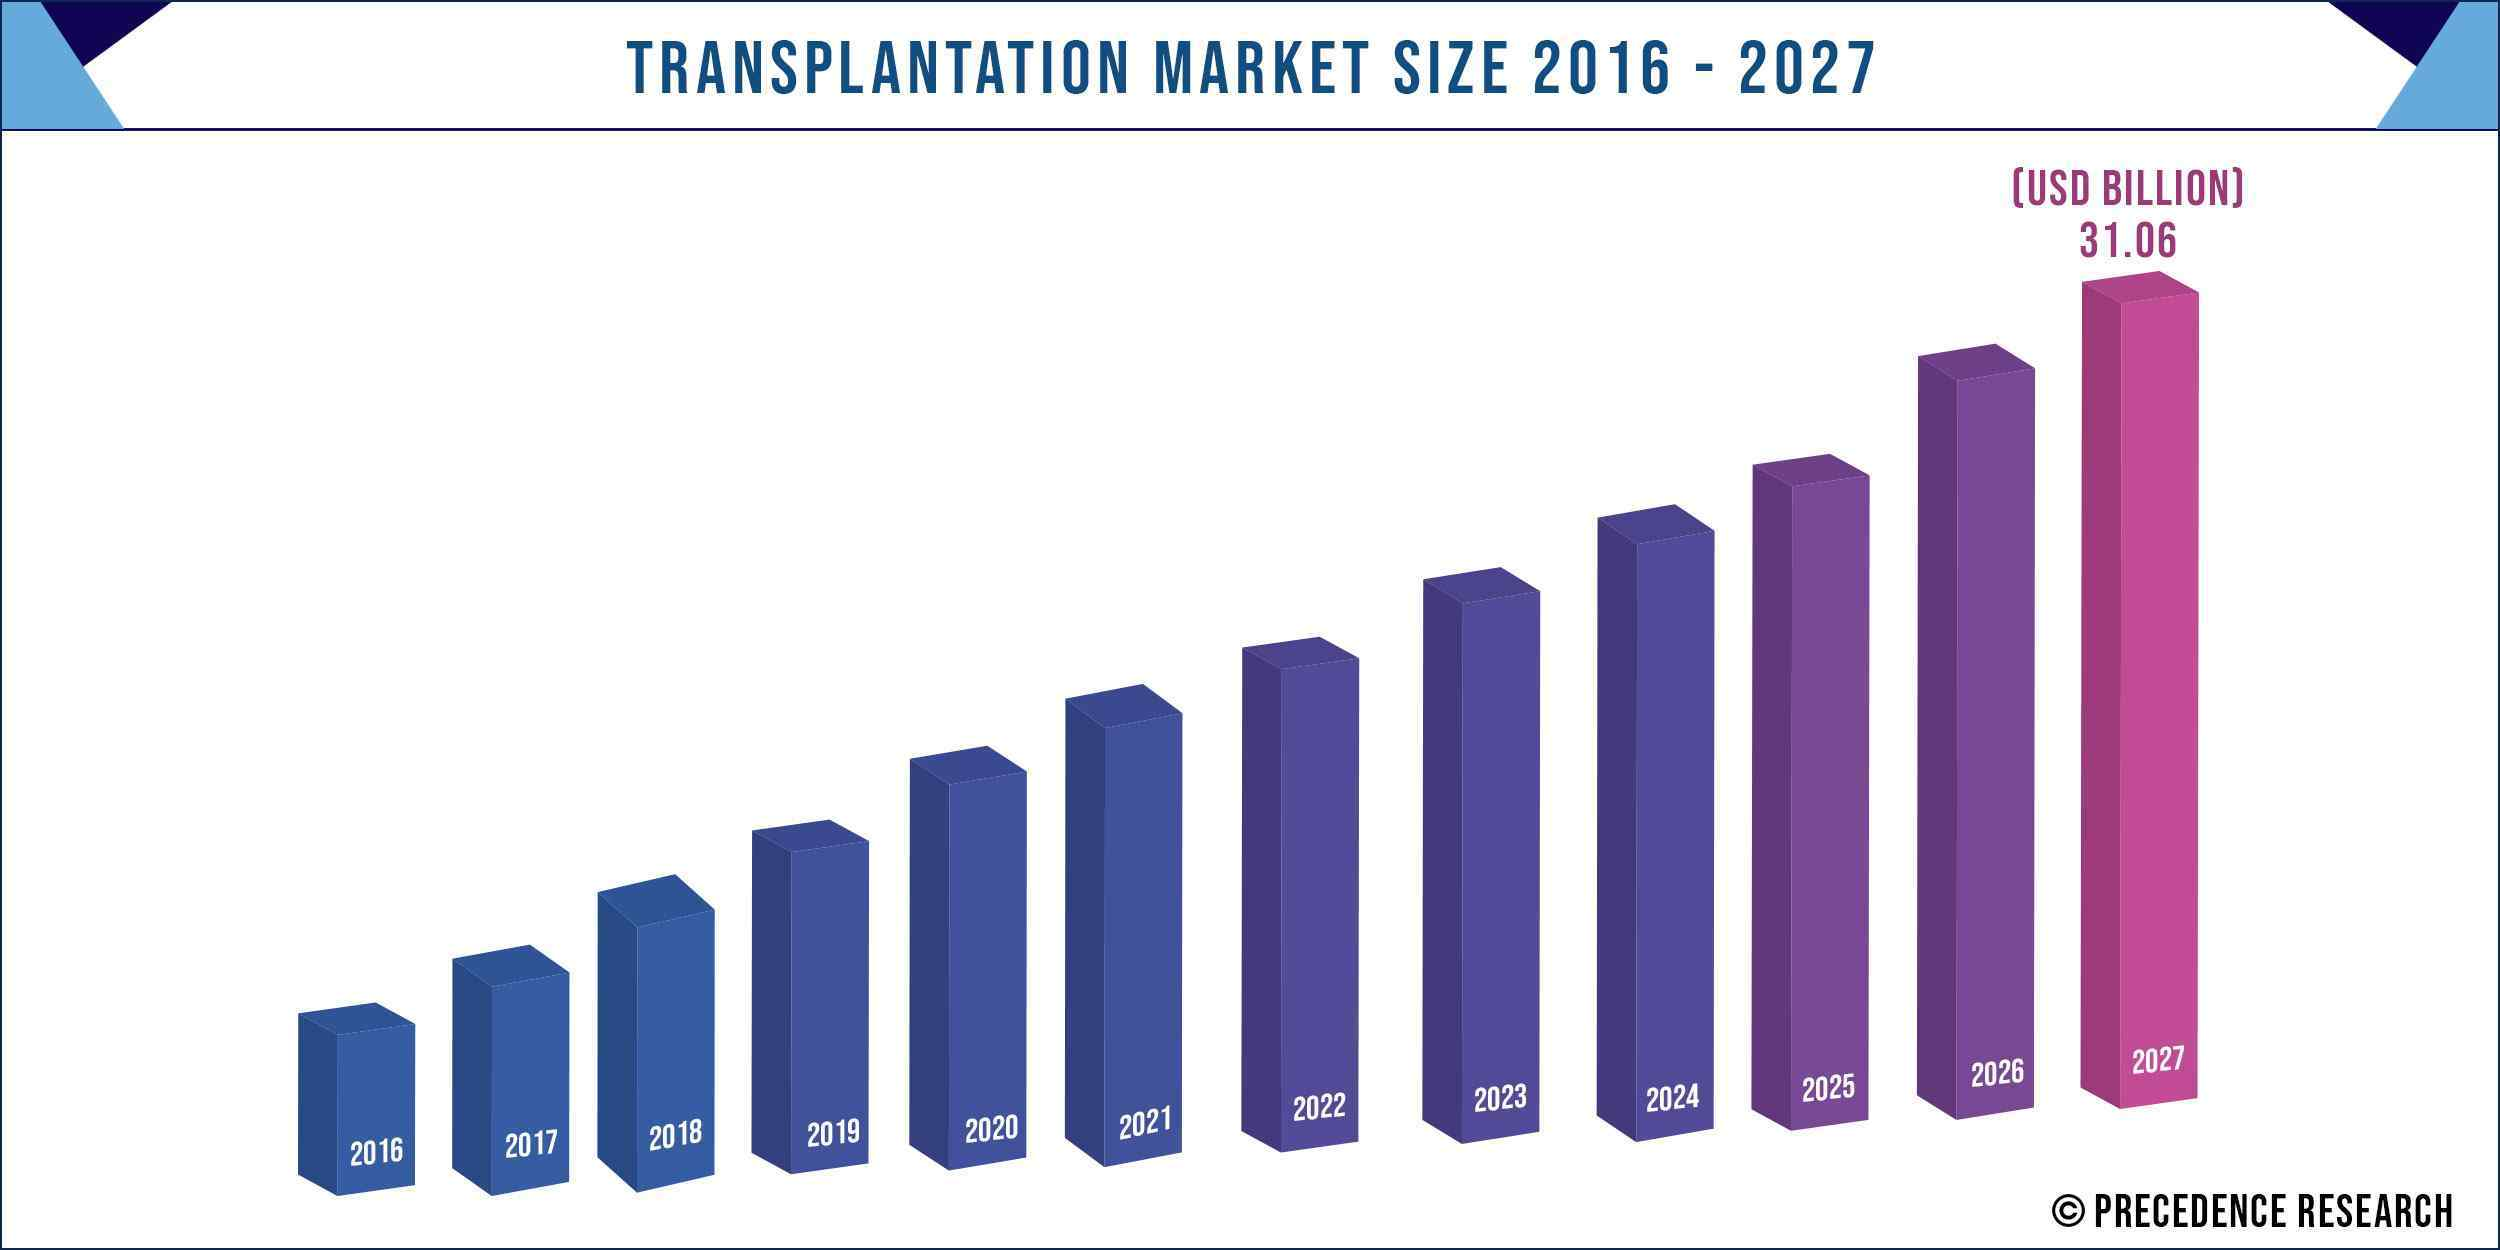 Transplantation Market Size 2016 to 2027